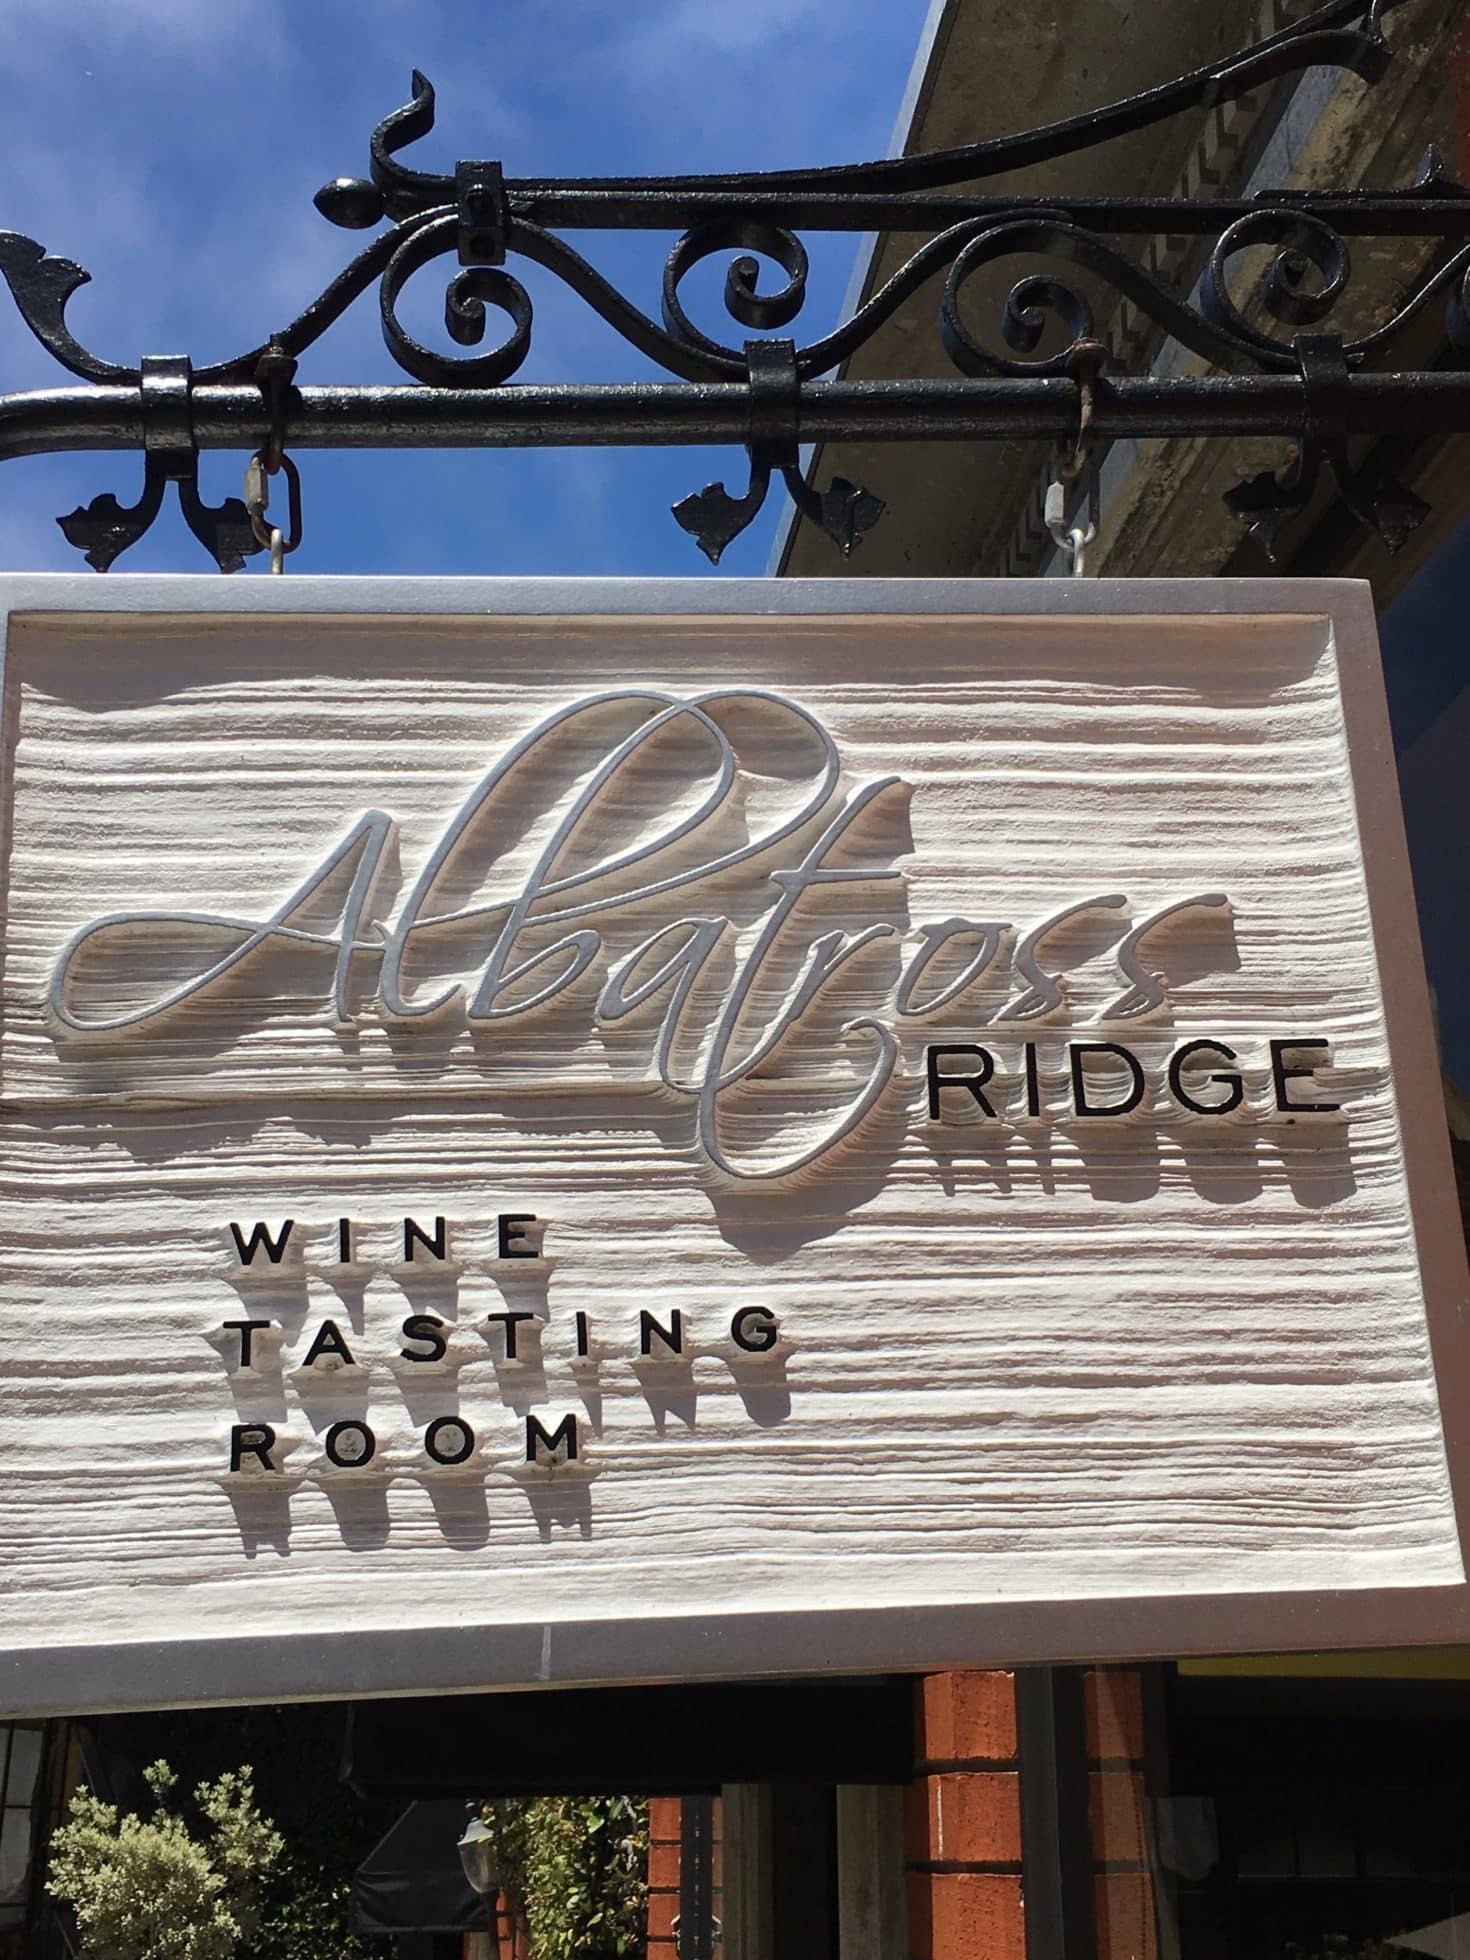 Albatross Ridge Wine Tasting Room Carmel